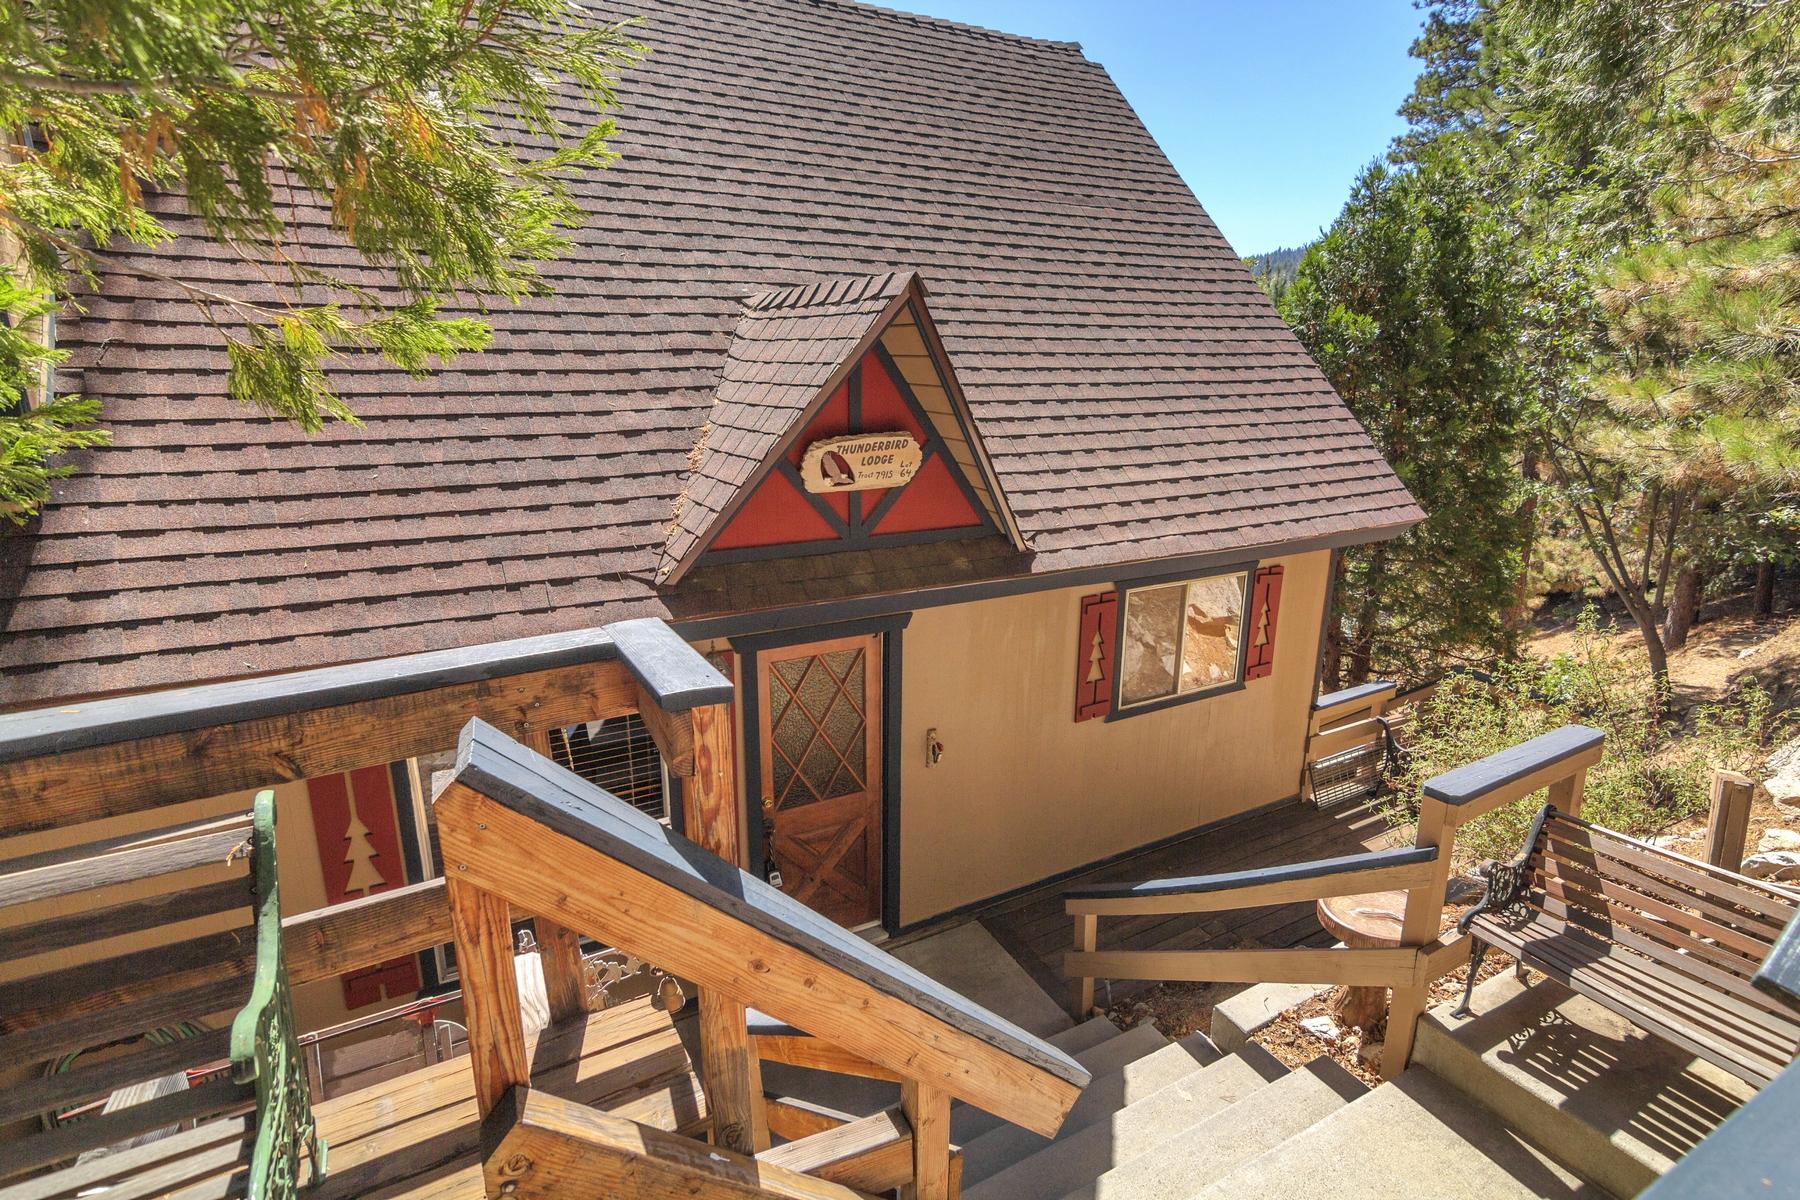 Single Family Home for Sale at 26609 Thunderbird Lake Arrowhead, California 92352 United States